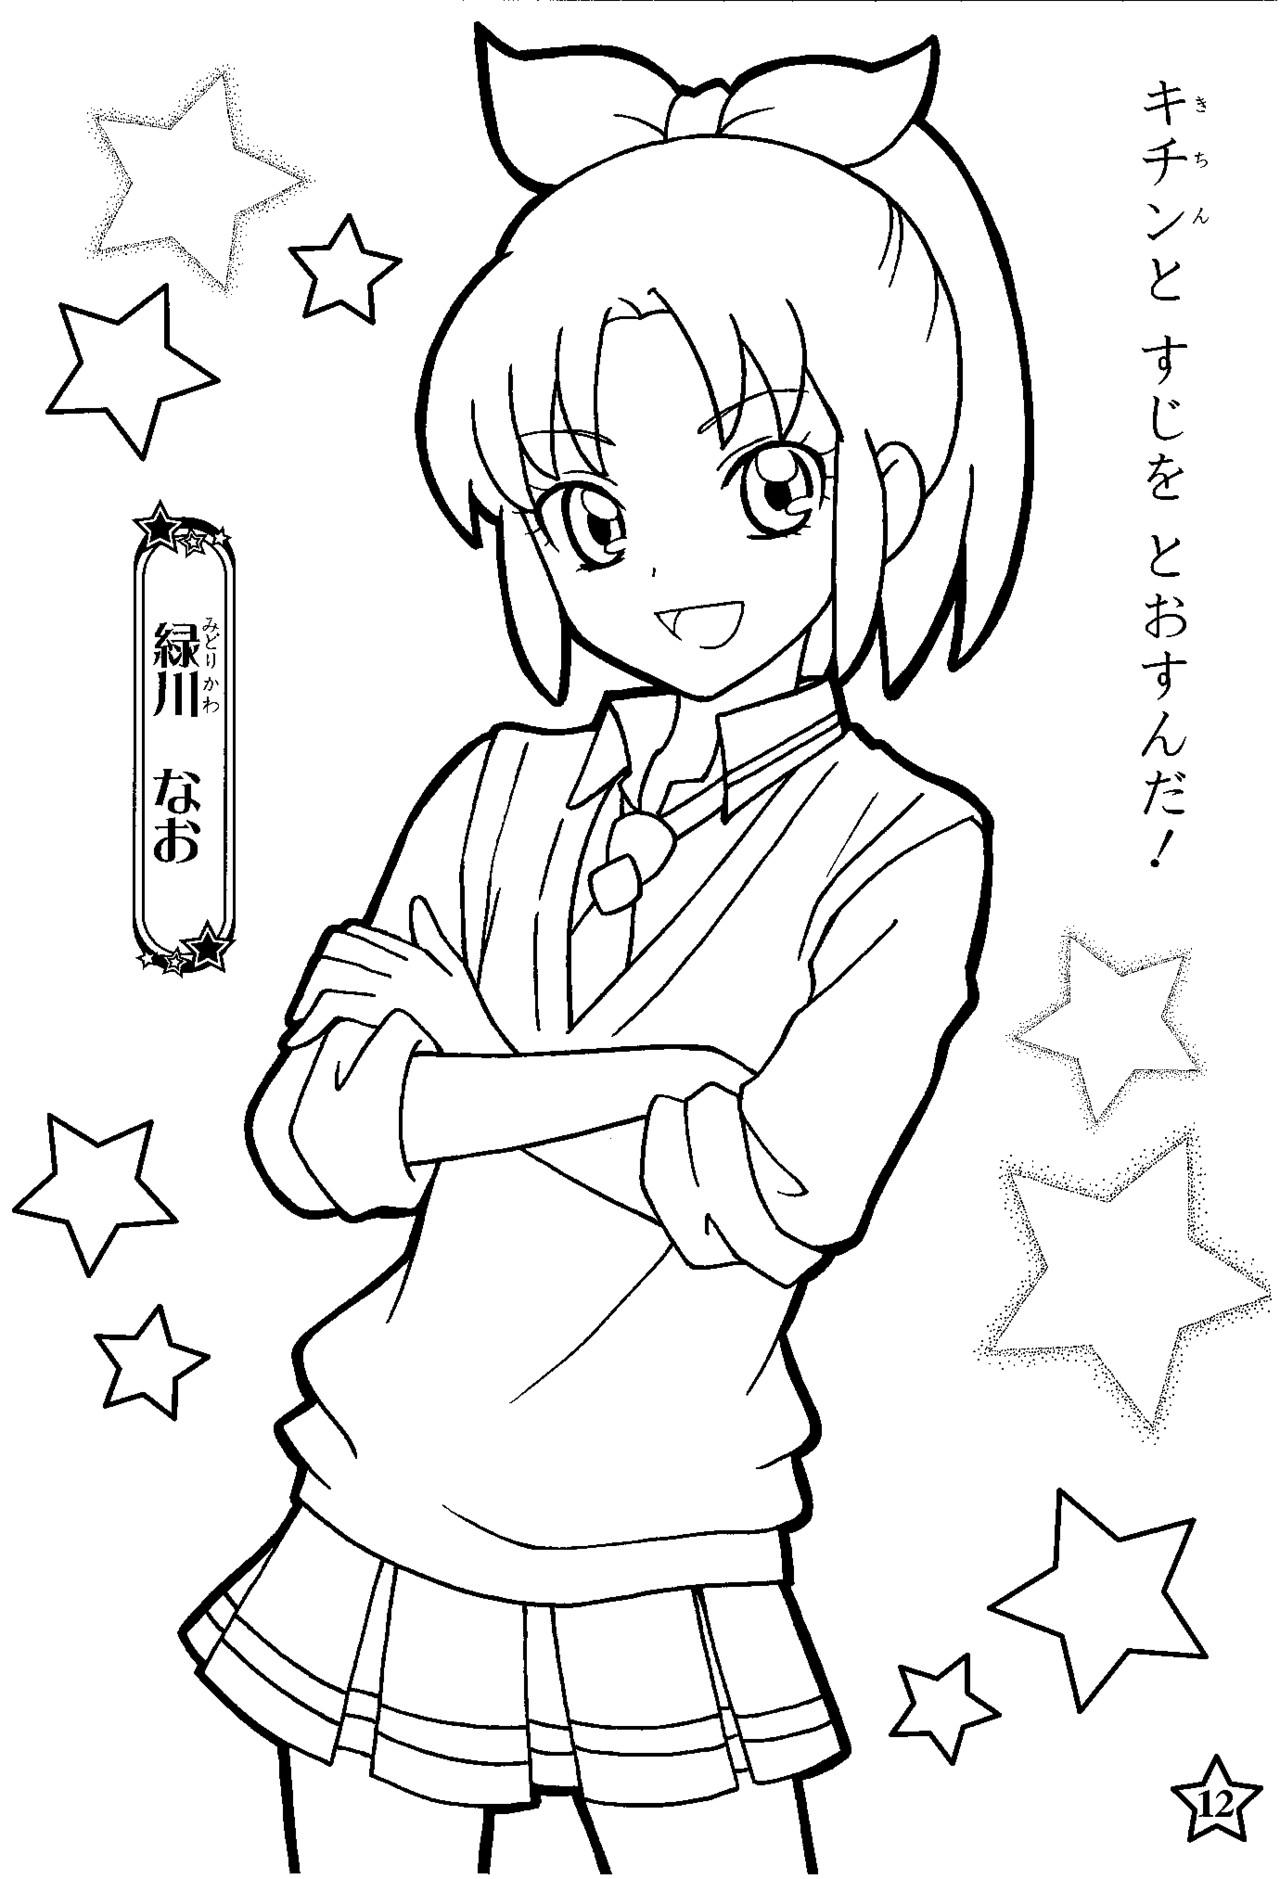 Ausmalbilder Anime Mädchen  KonaBeun zum ausdrucken ausmalbilder manga